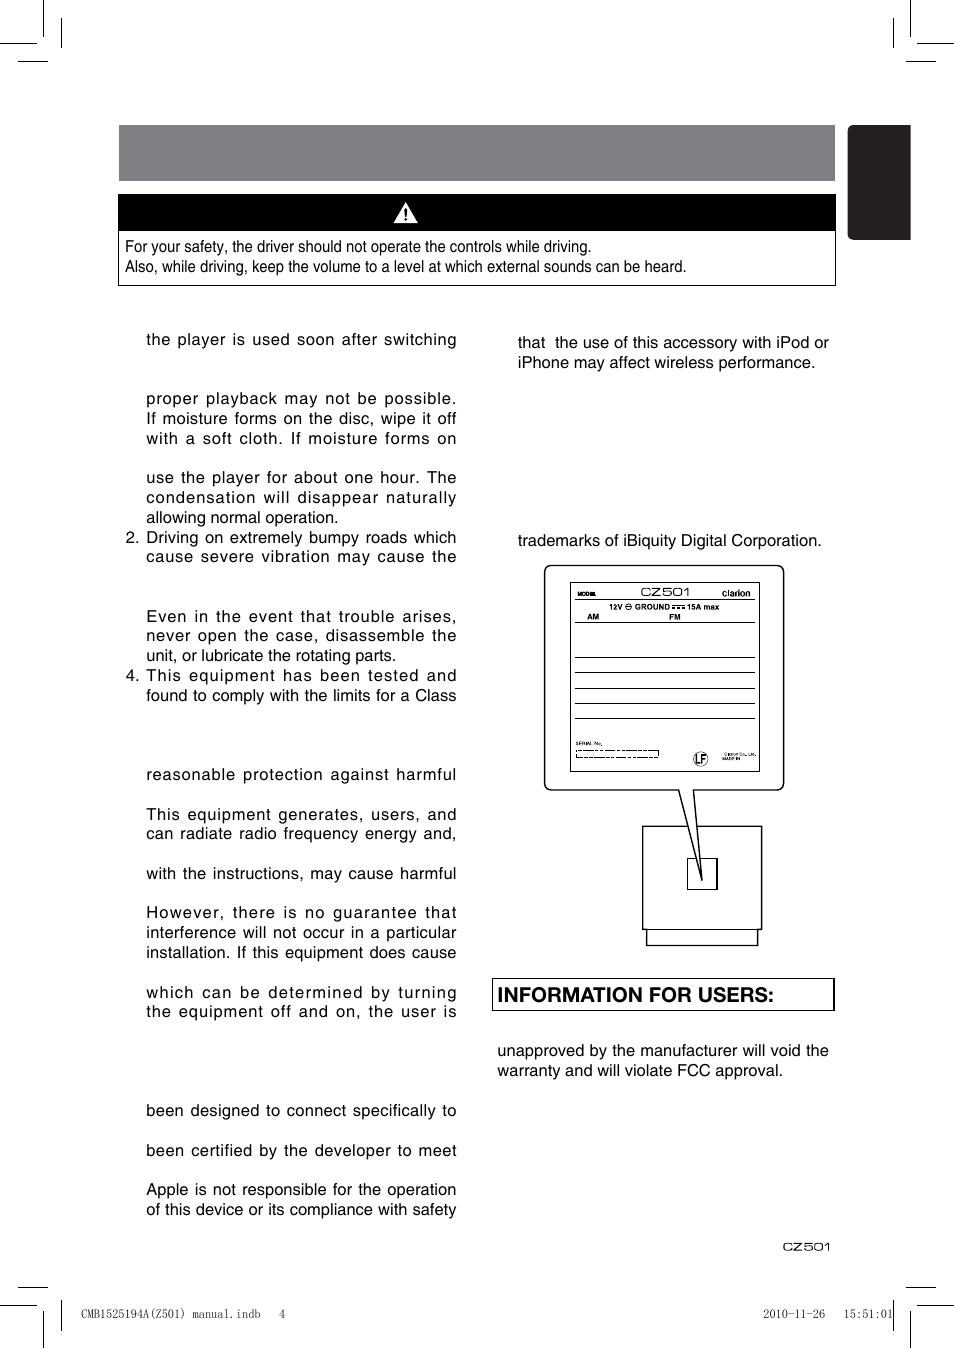 precautions information for users english clarion cz501 user rh manualsdir com Clarion CX501 Clarion CMD5